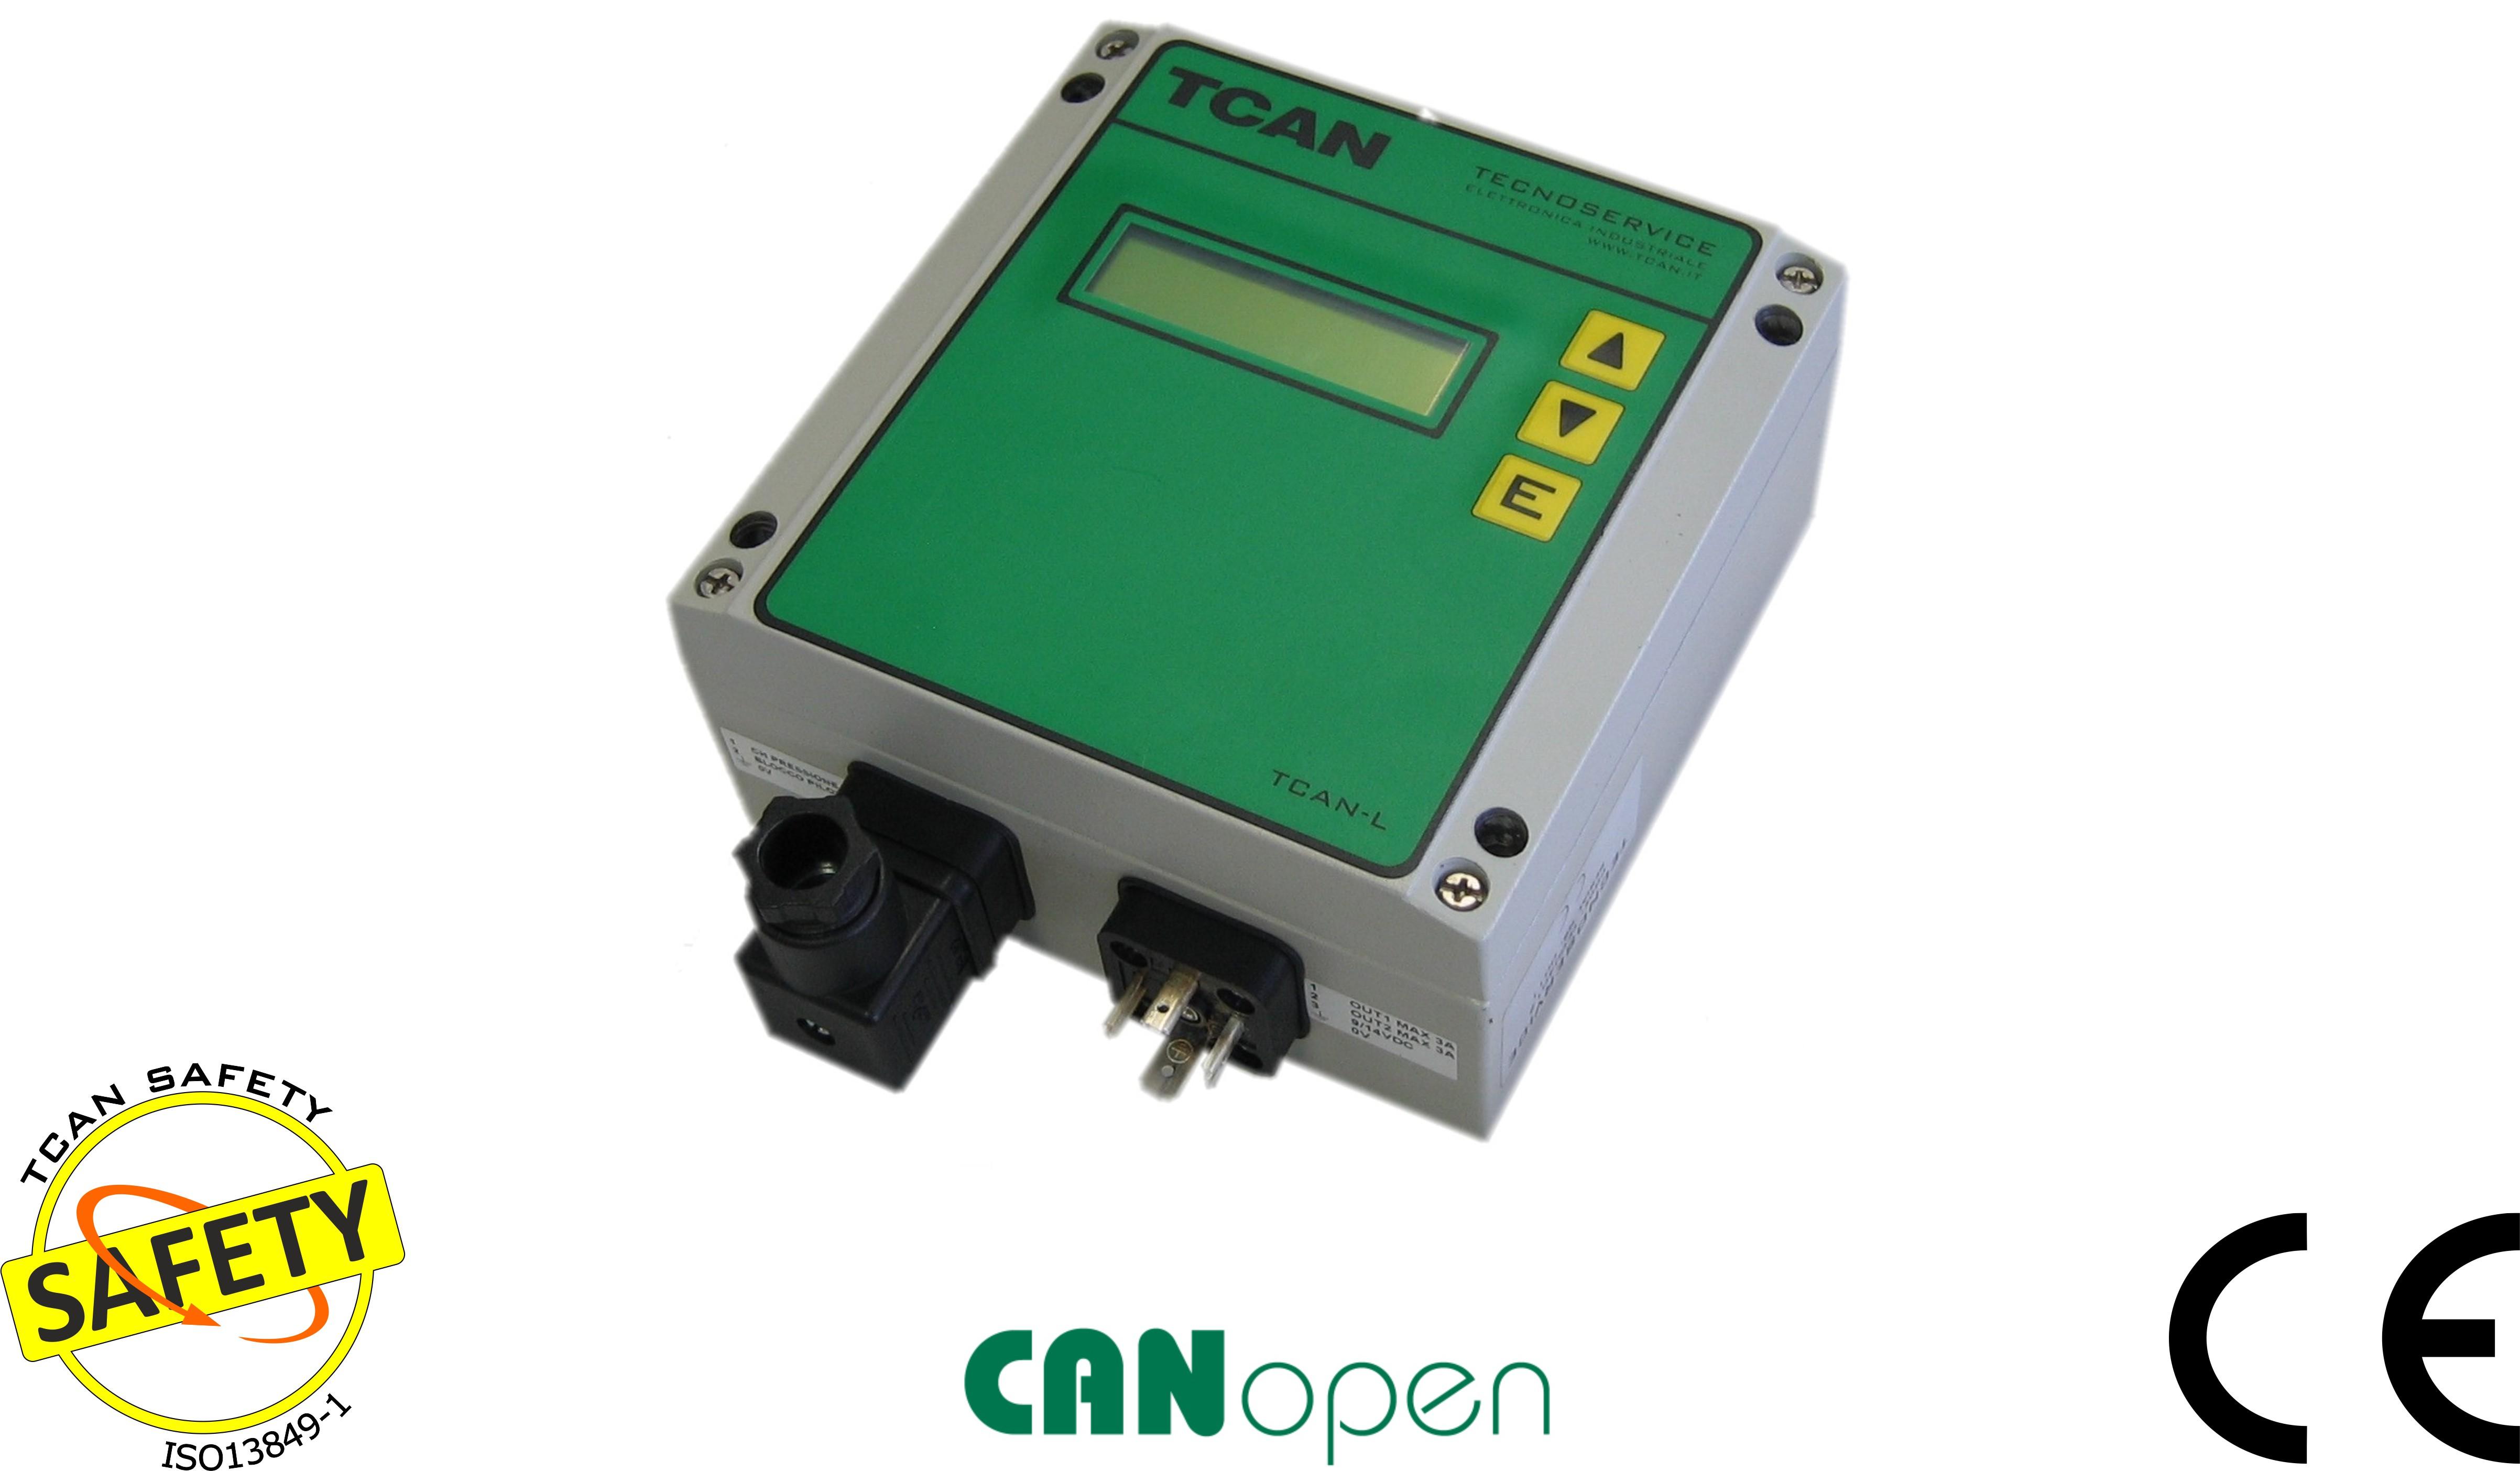 TCAN-LIV Image